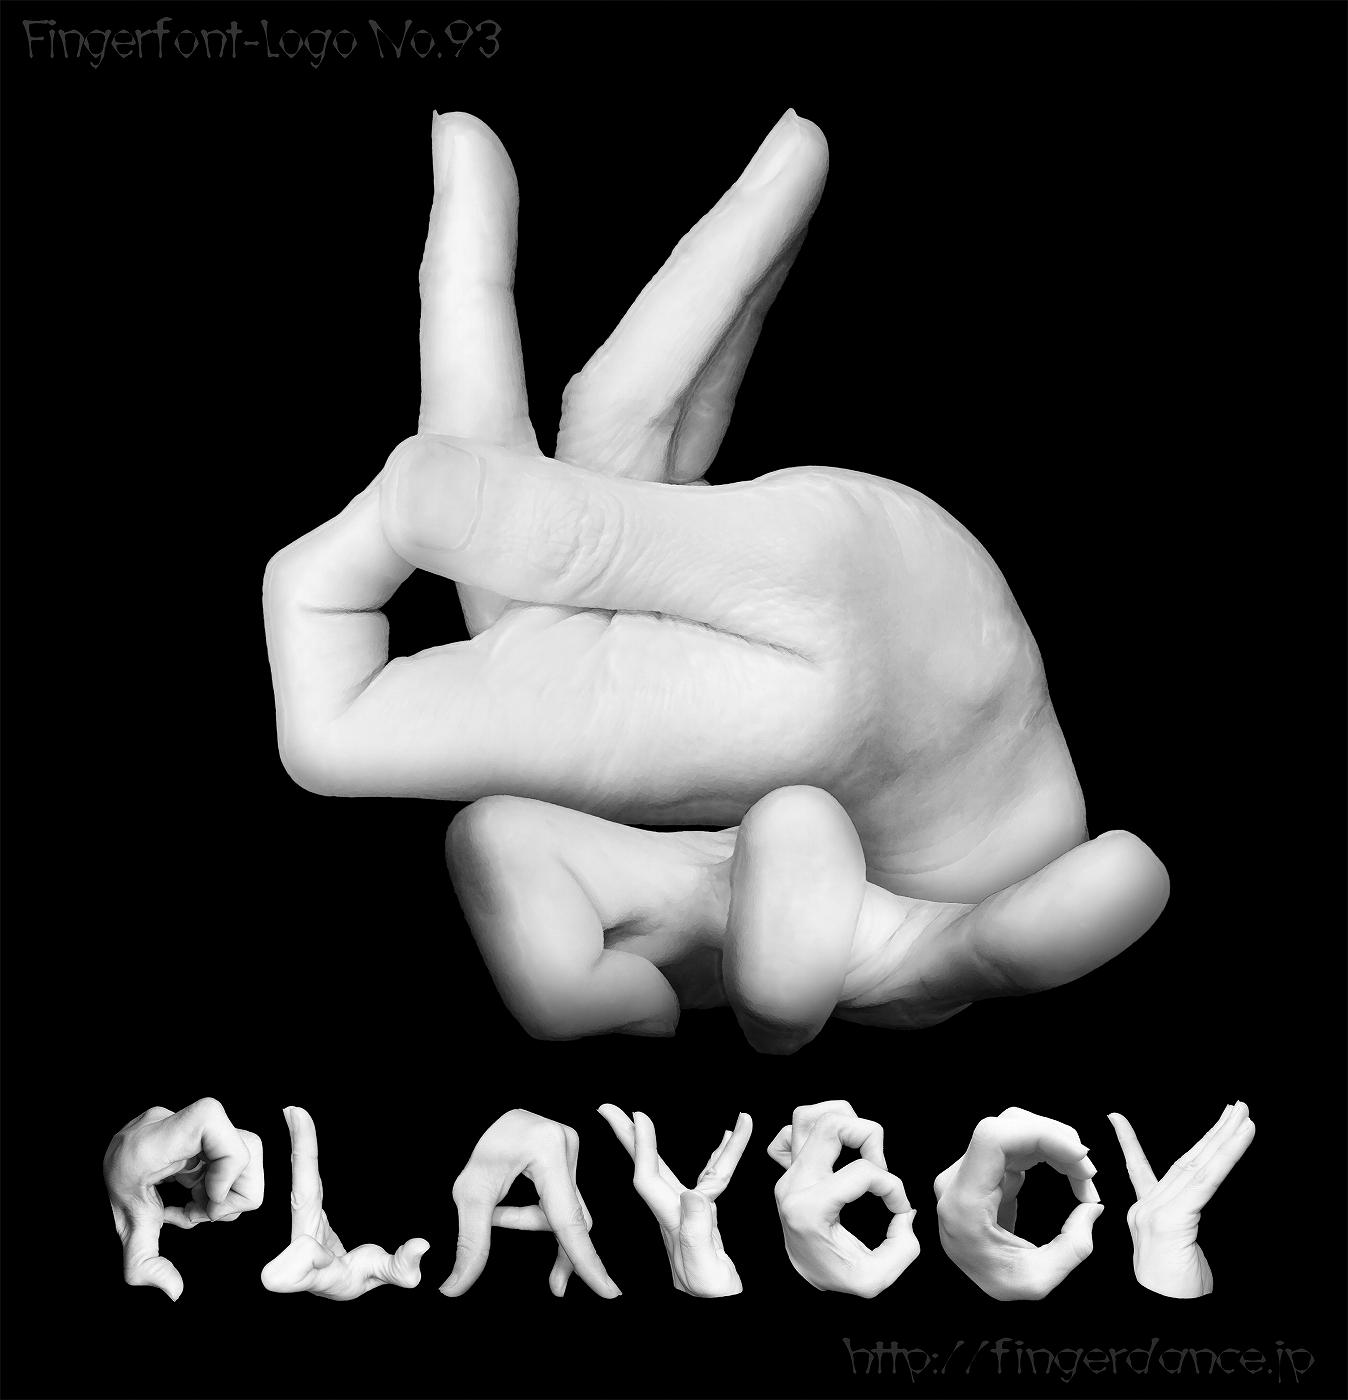 PlayBoy-fingerlogohandプレイボーイ・フィンガーロゴハンド手指